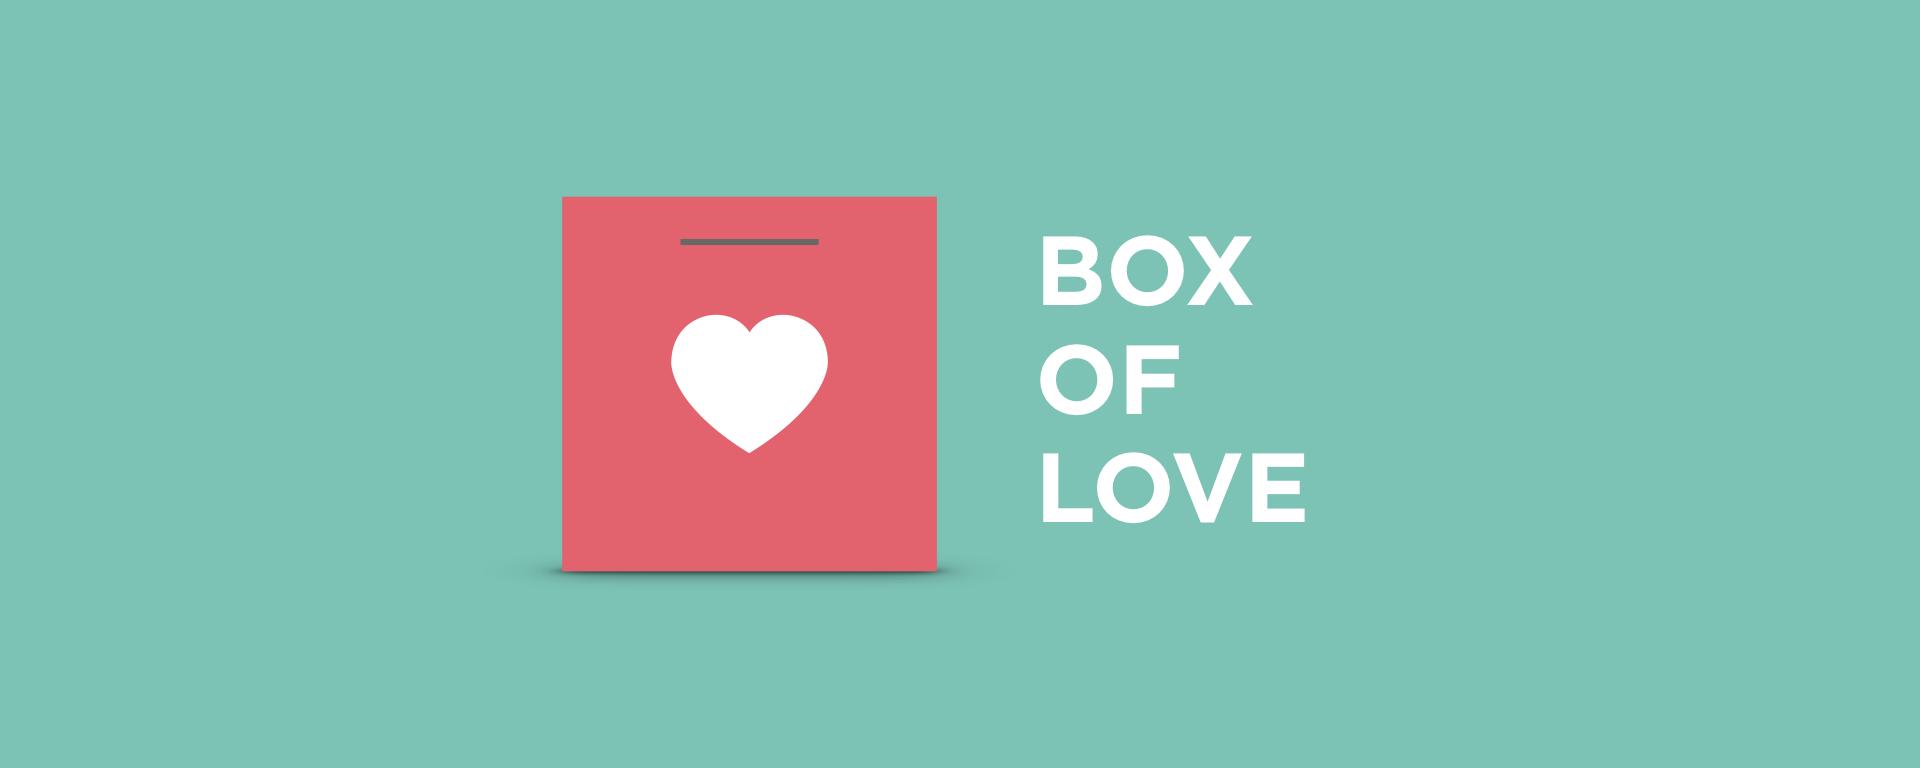 box-of-love-banner.001.jpeg